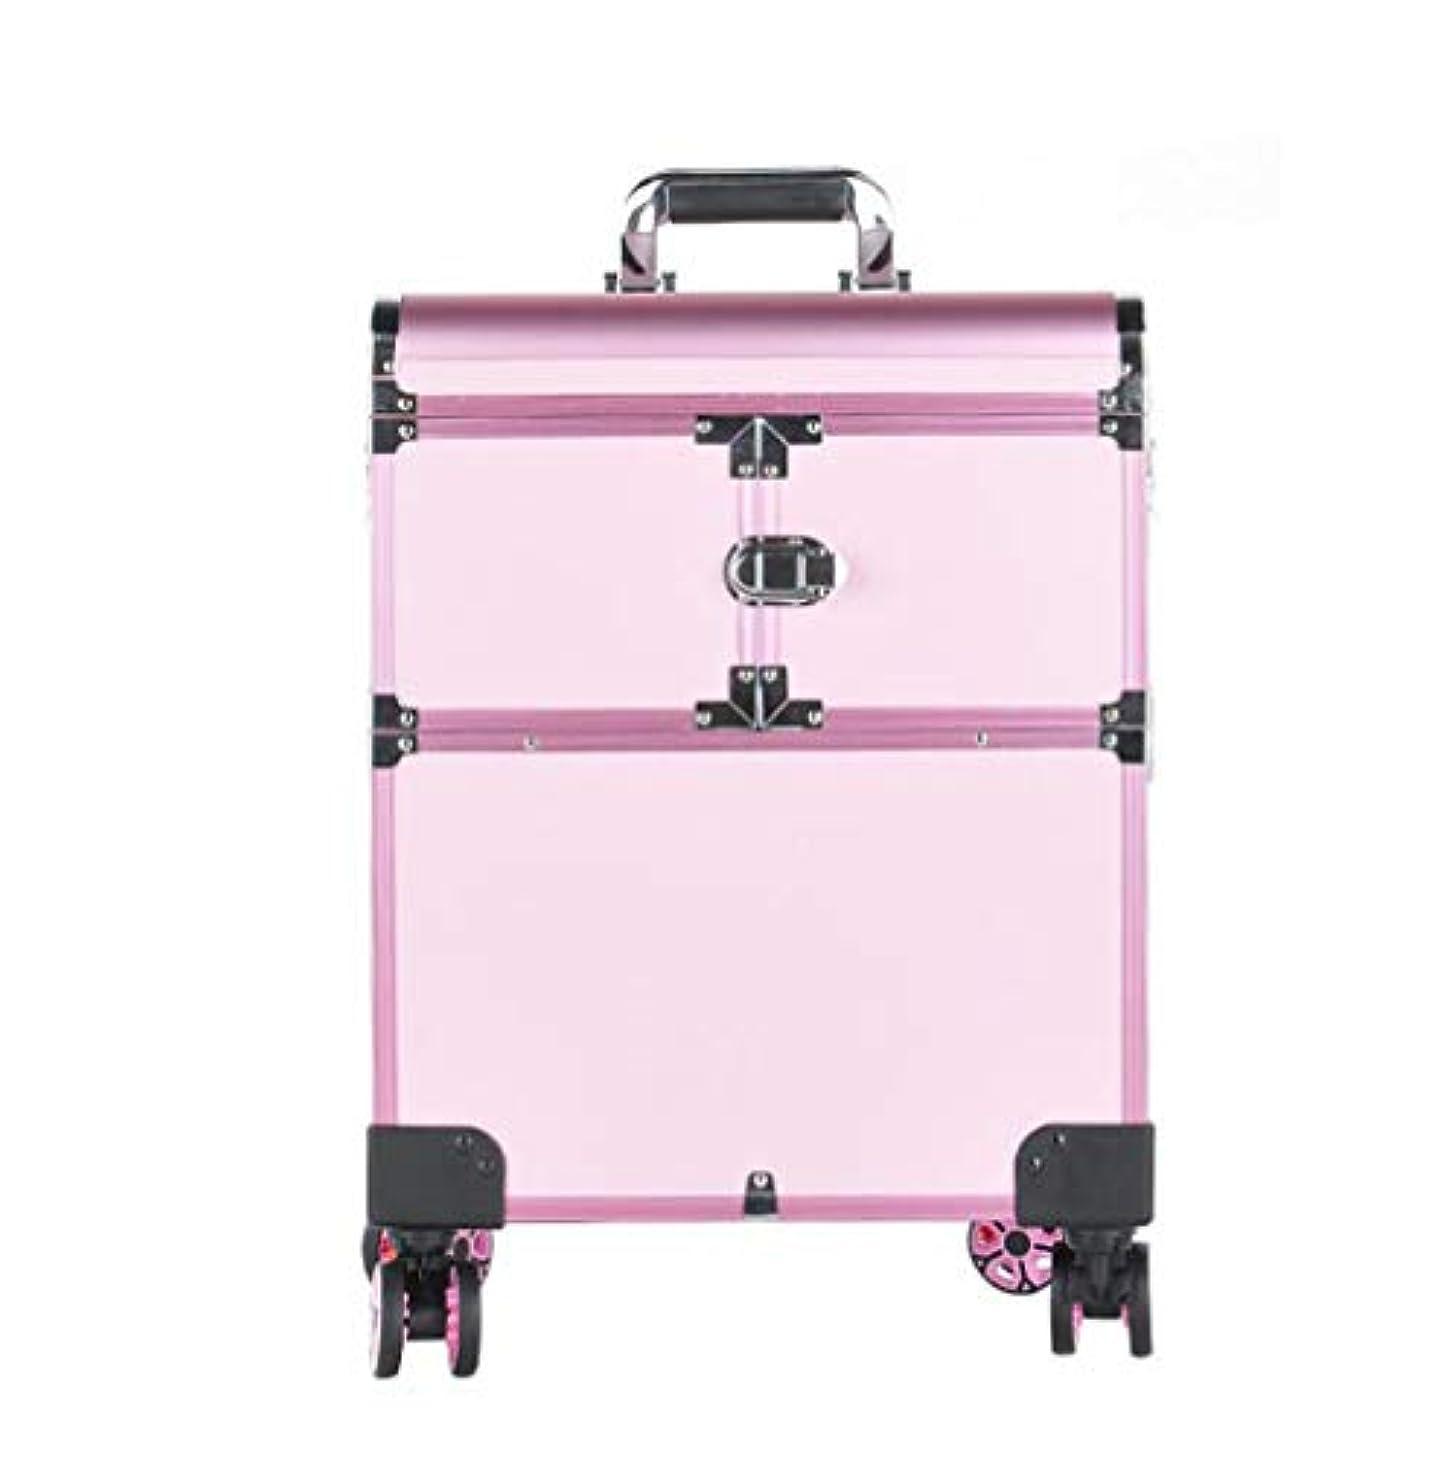 BUMC 特大化粧列車化粧トロリーケース、多層大容量プロフェッショナル化粧品ポータブルレバーオーガナイザー収納ビューティーボックス,Pink